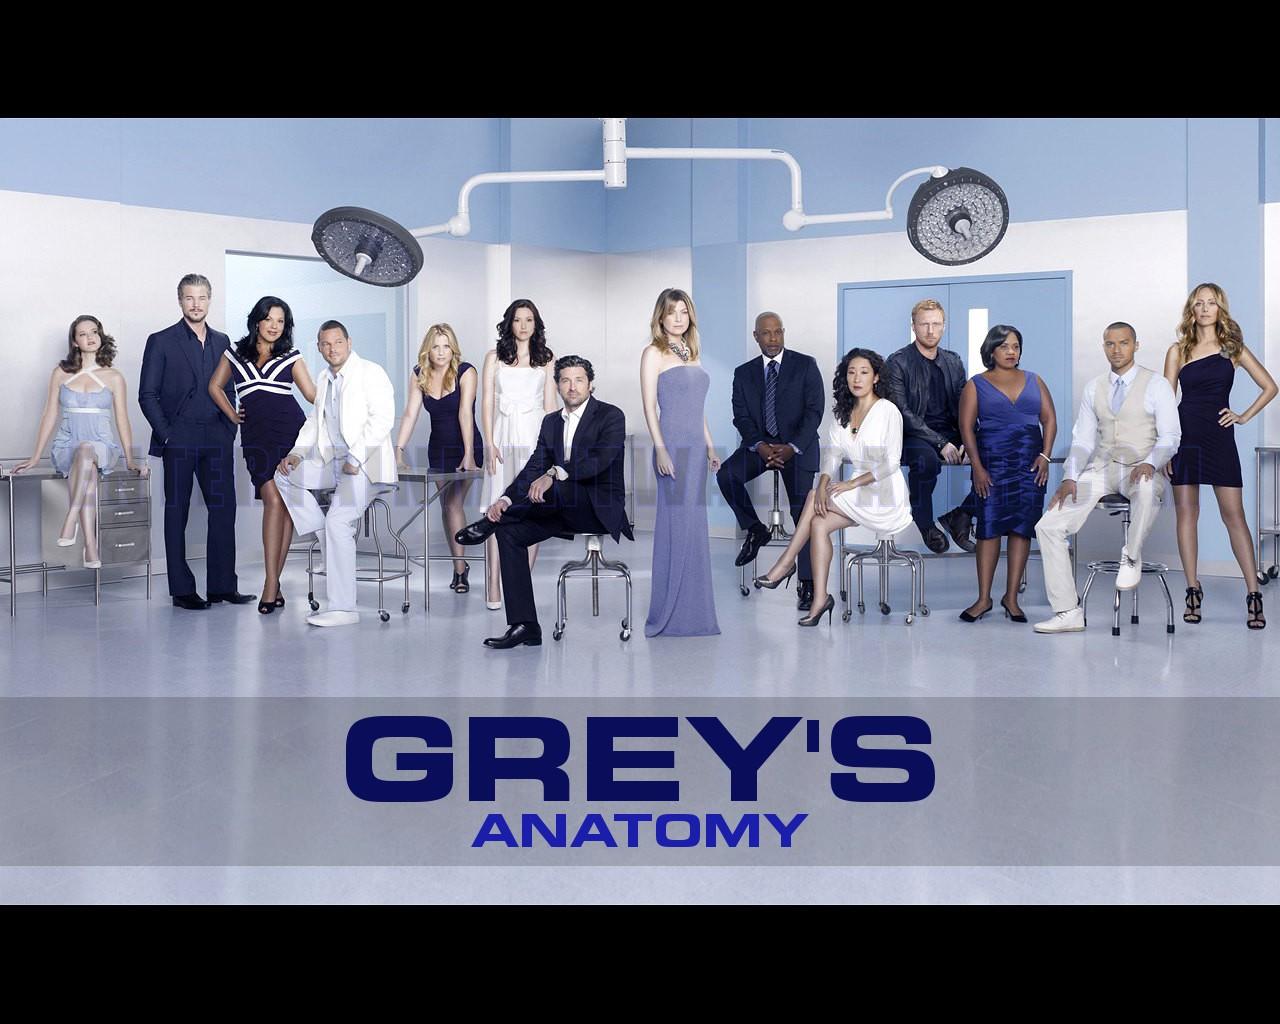 15 Temporada De Grey's Anatomy Assistir grey's anatomy wallpaper - greys anatomy cast season 7